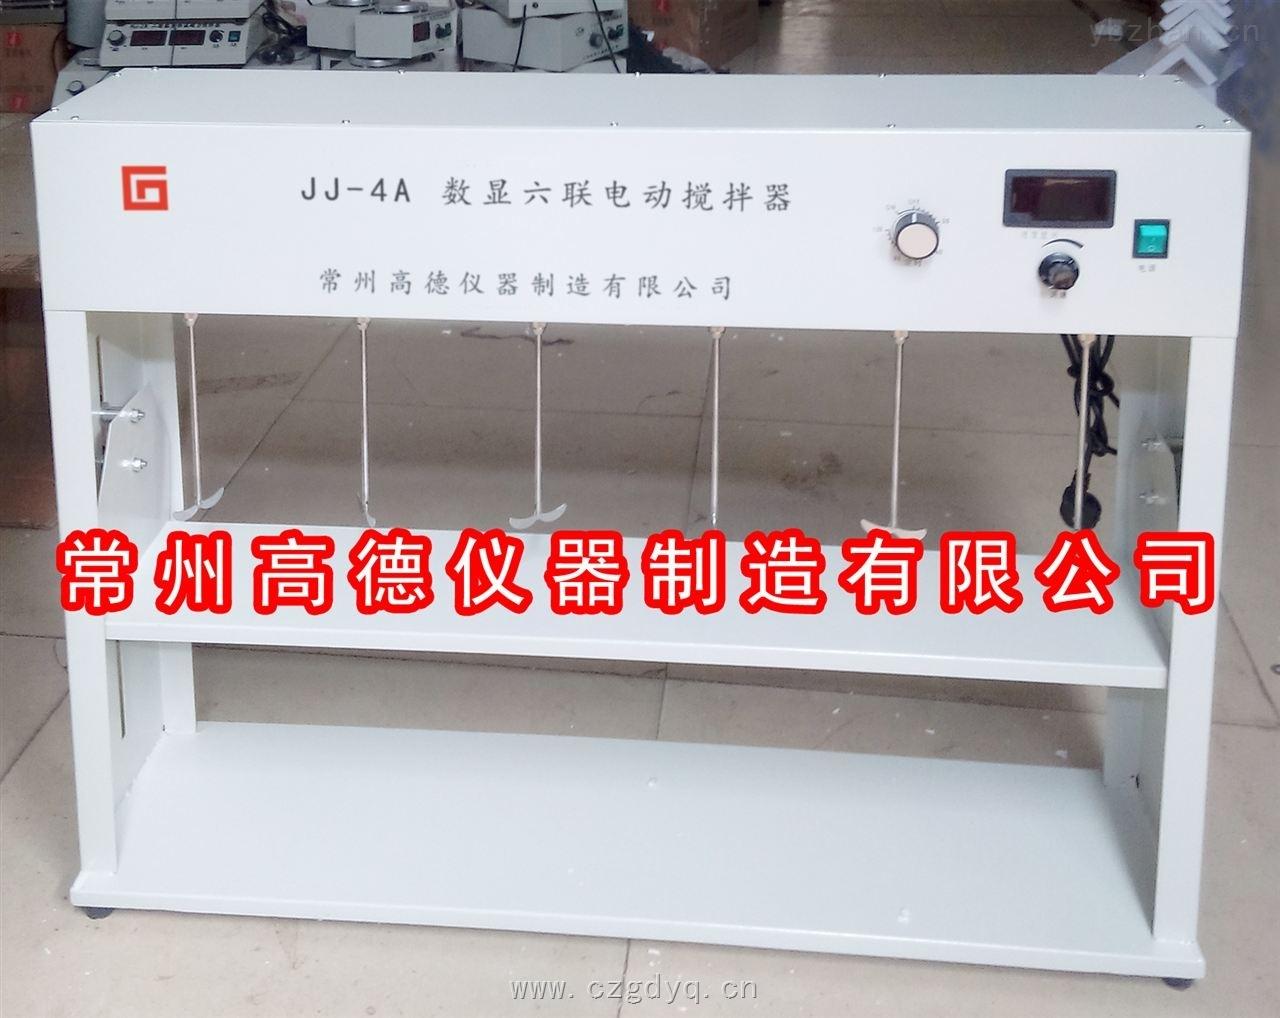 JJ-4A-數顯六聯同步電動攪拌器